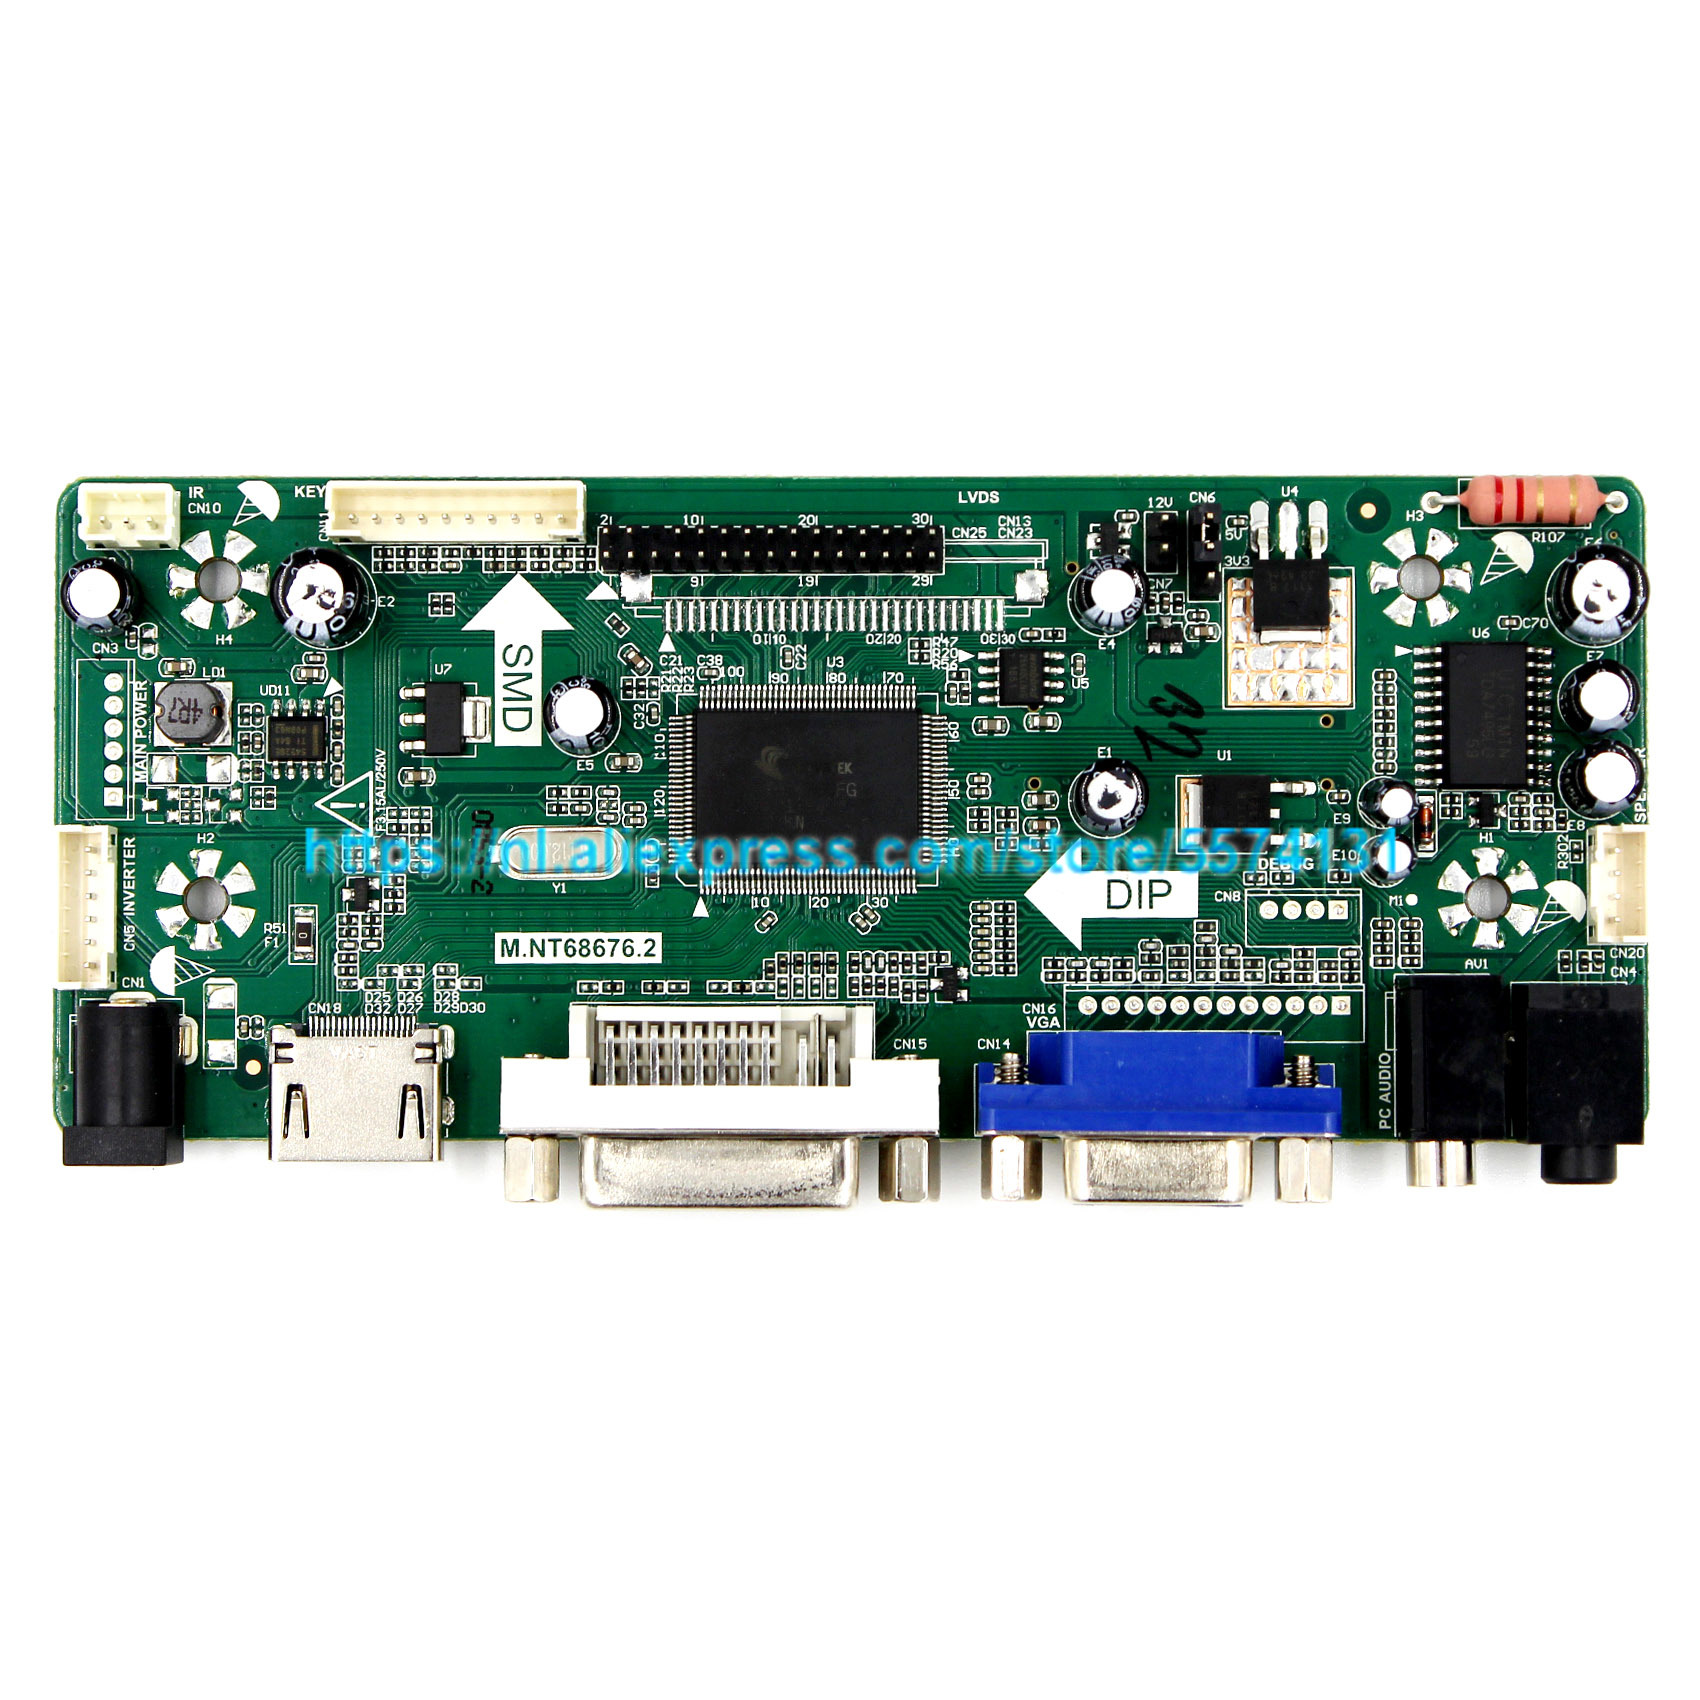 VGA+HDMI+DVI LCD LED screen Controller Driver Board Work Kit For B156HW01 V.7 V7